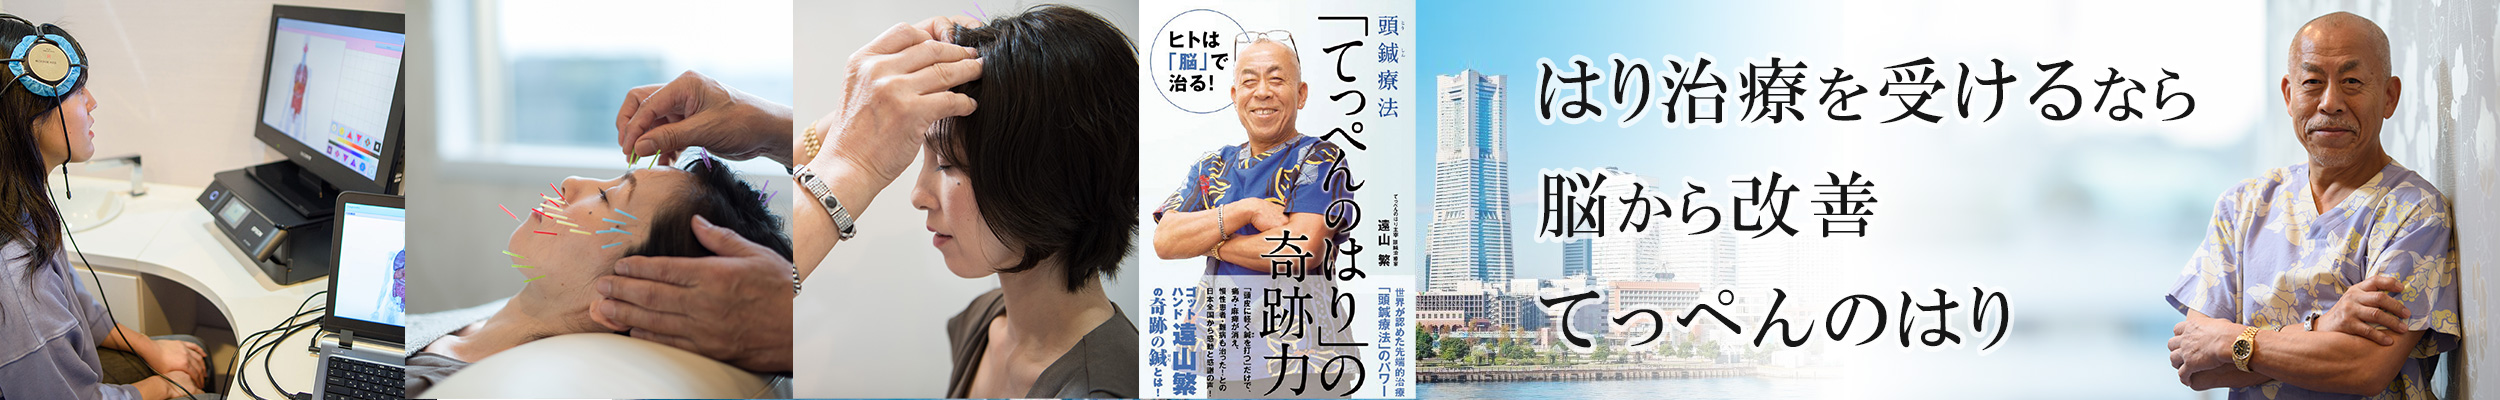 YNSA頭鍼&美容鍼 てっぺんのはり そごう横浜店